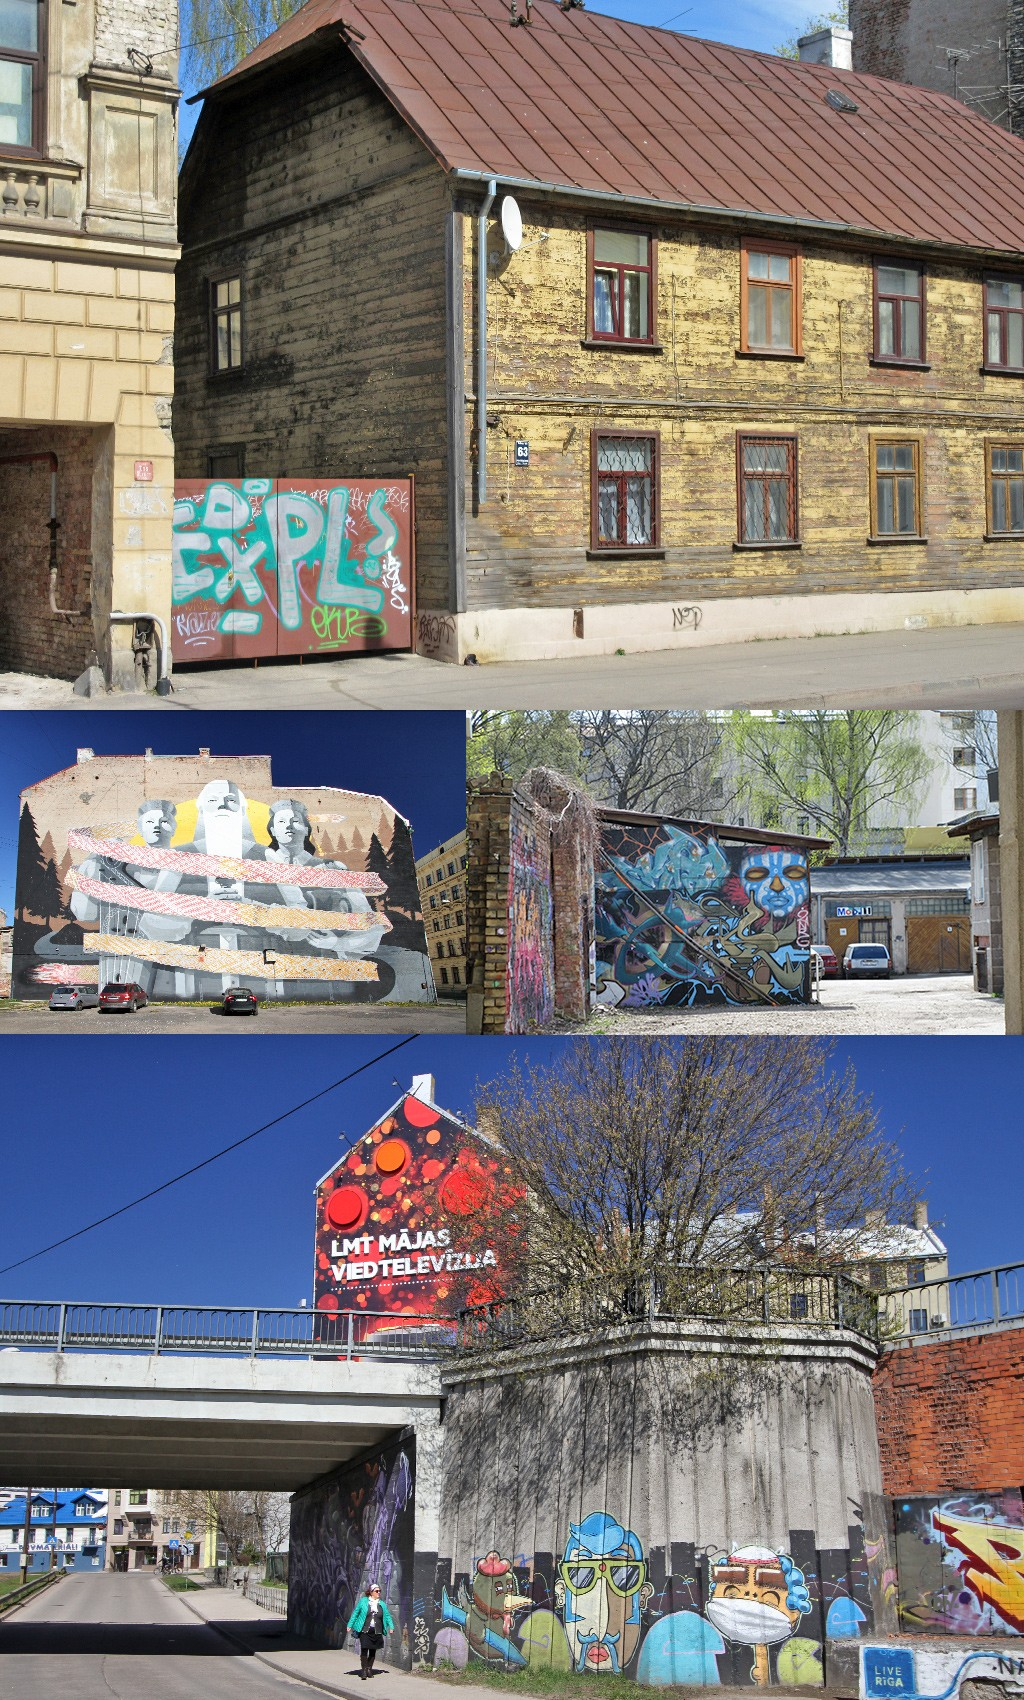 streetart Maskavas en Grizinkalns